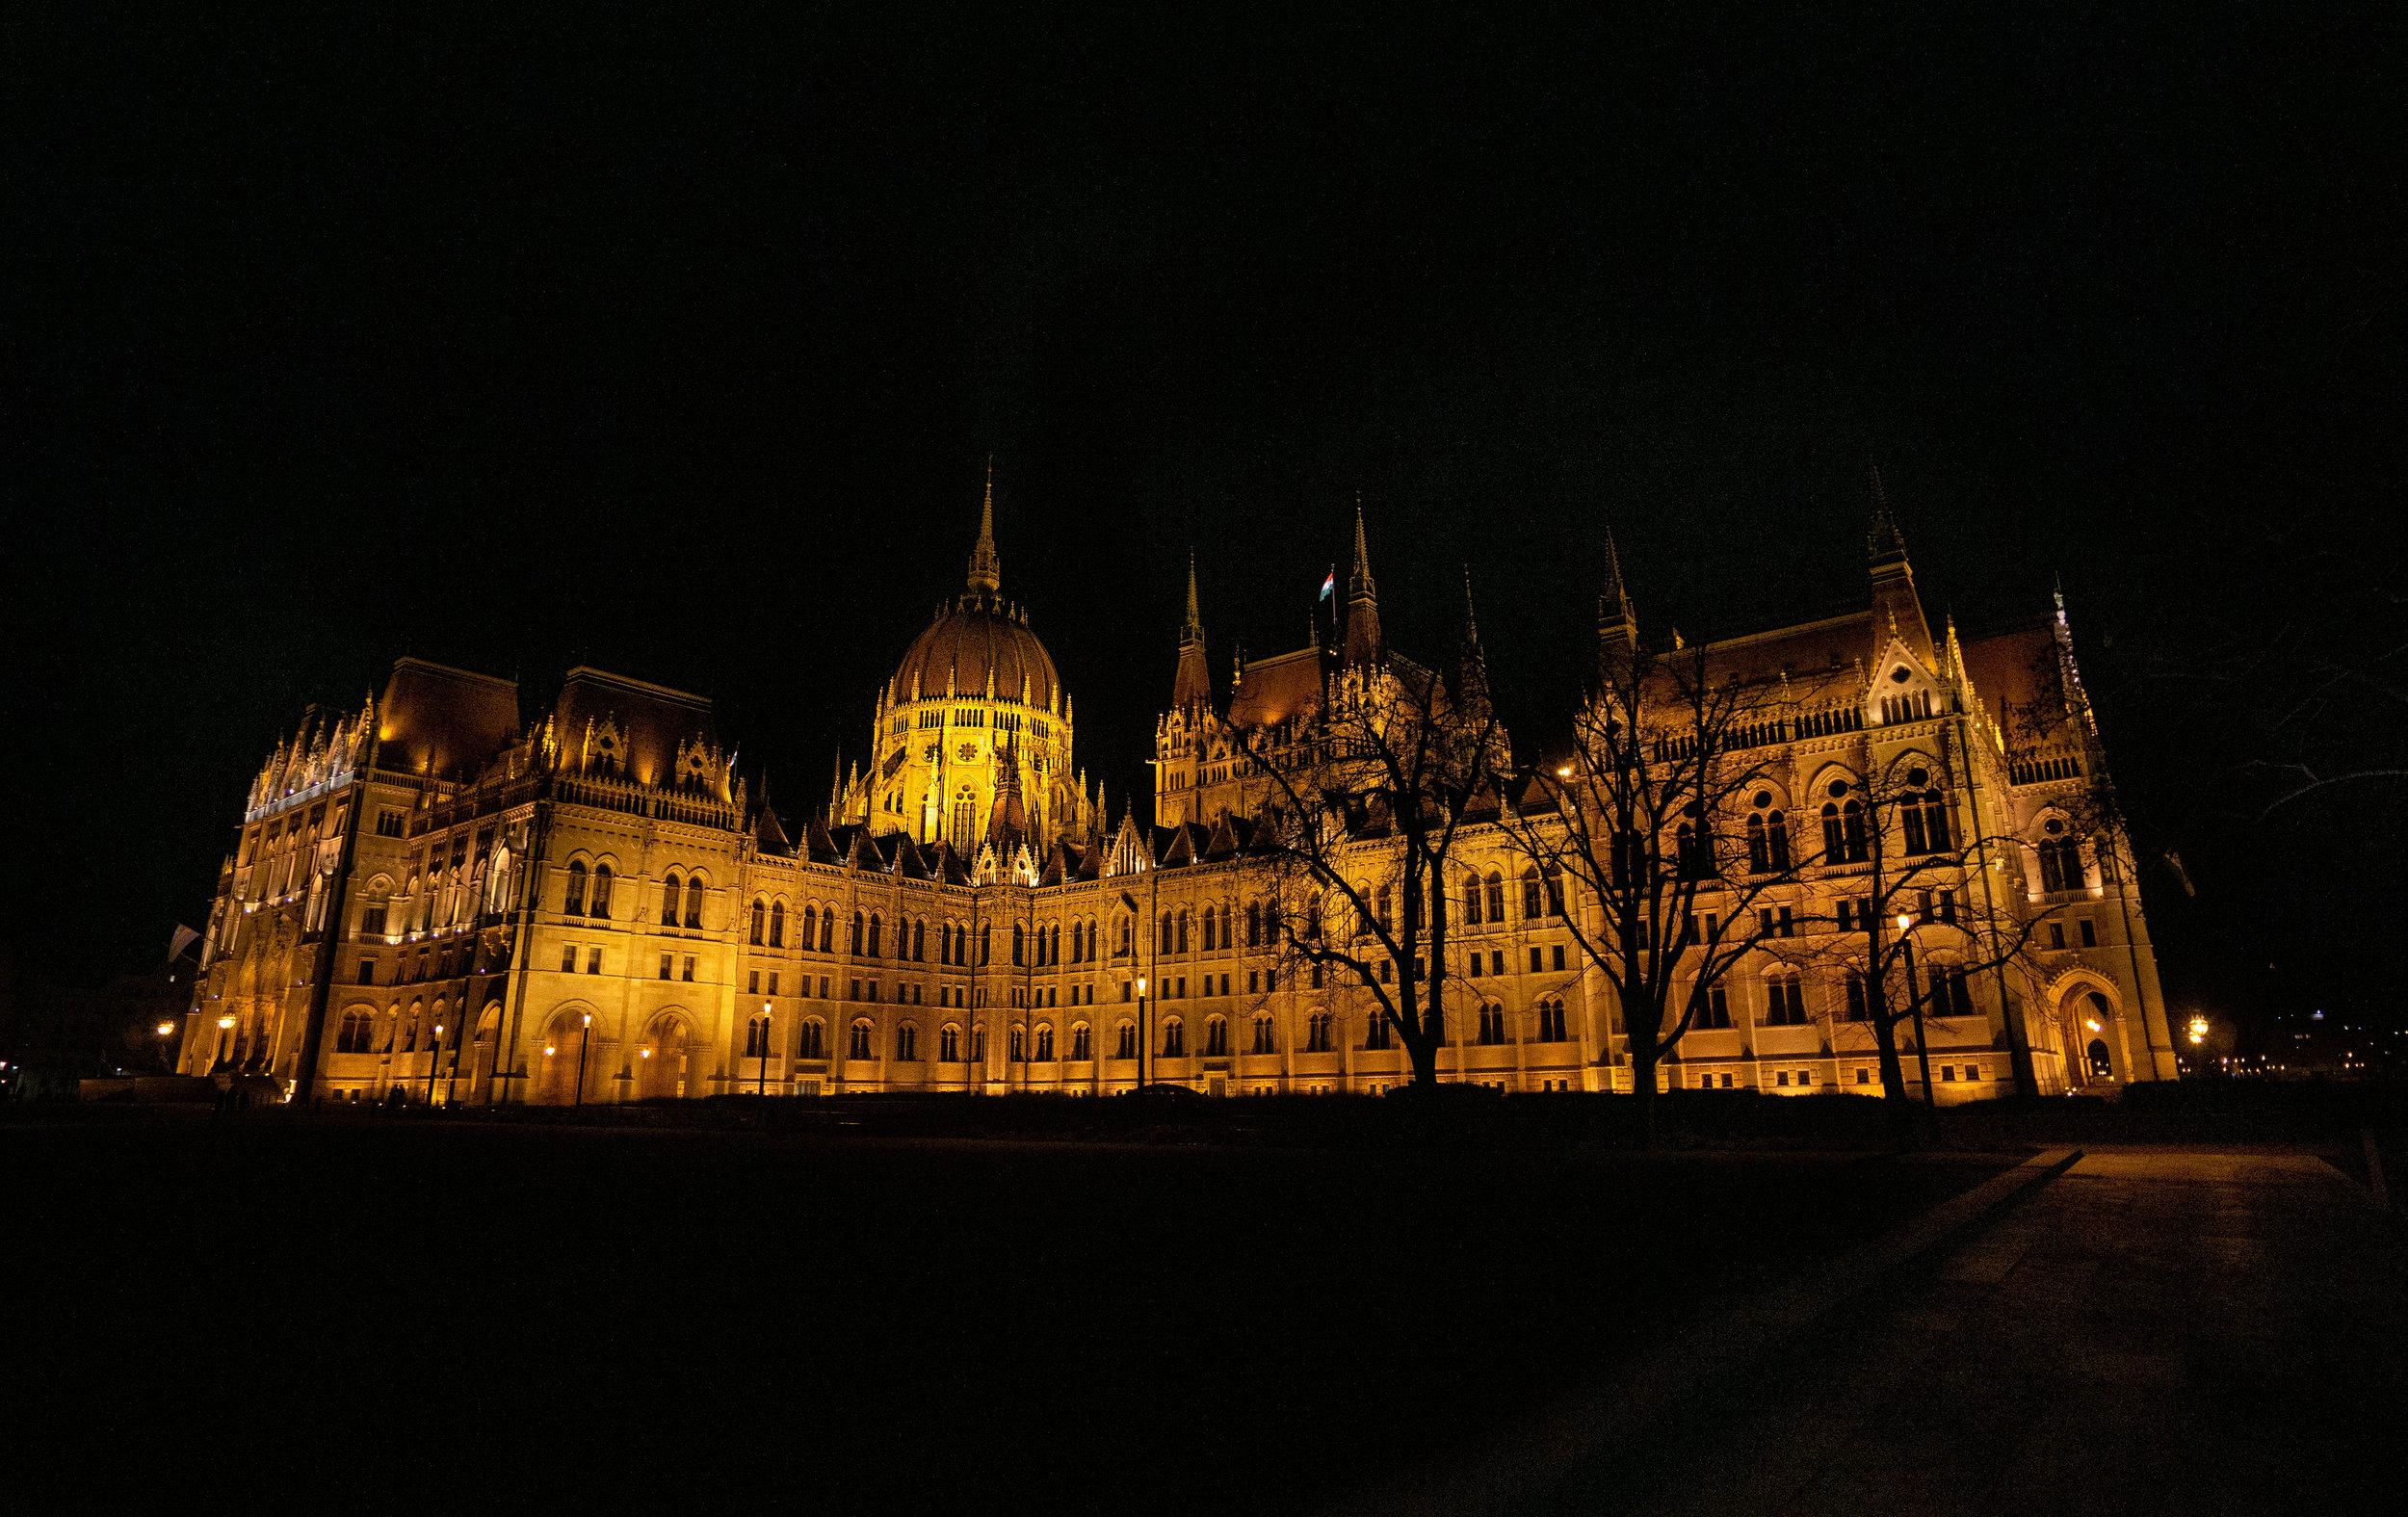 budapest_parliament_building_vickygood_travel_photographysm.jpg